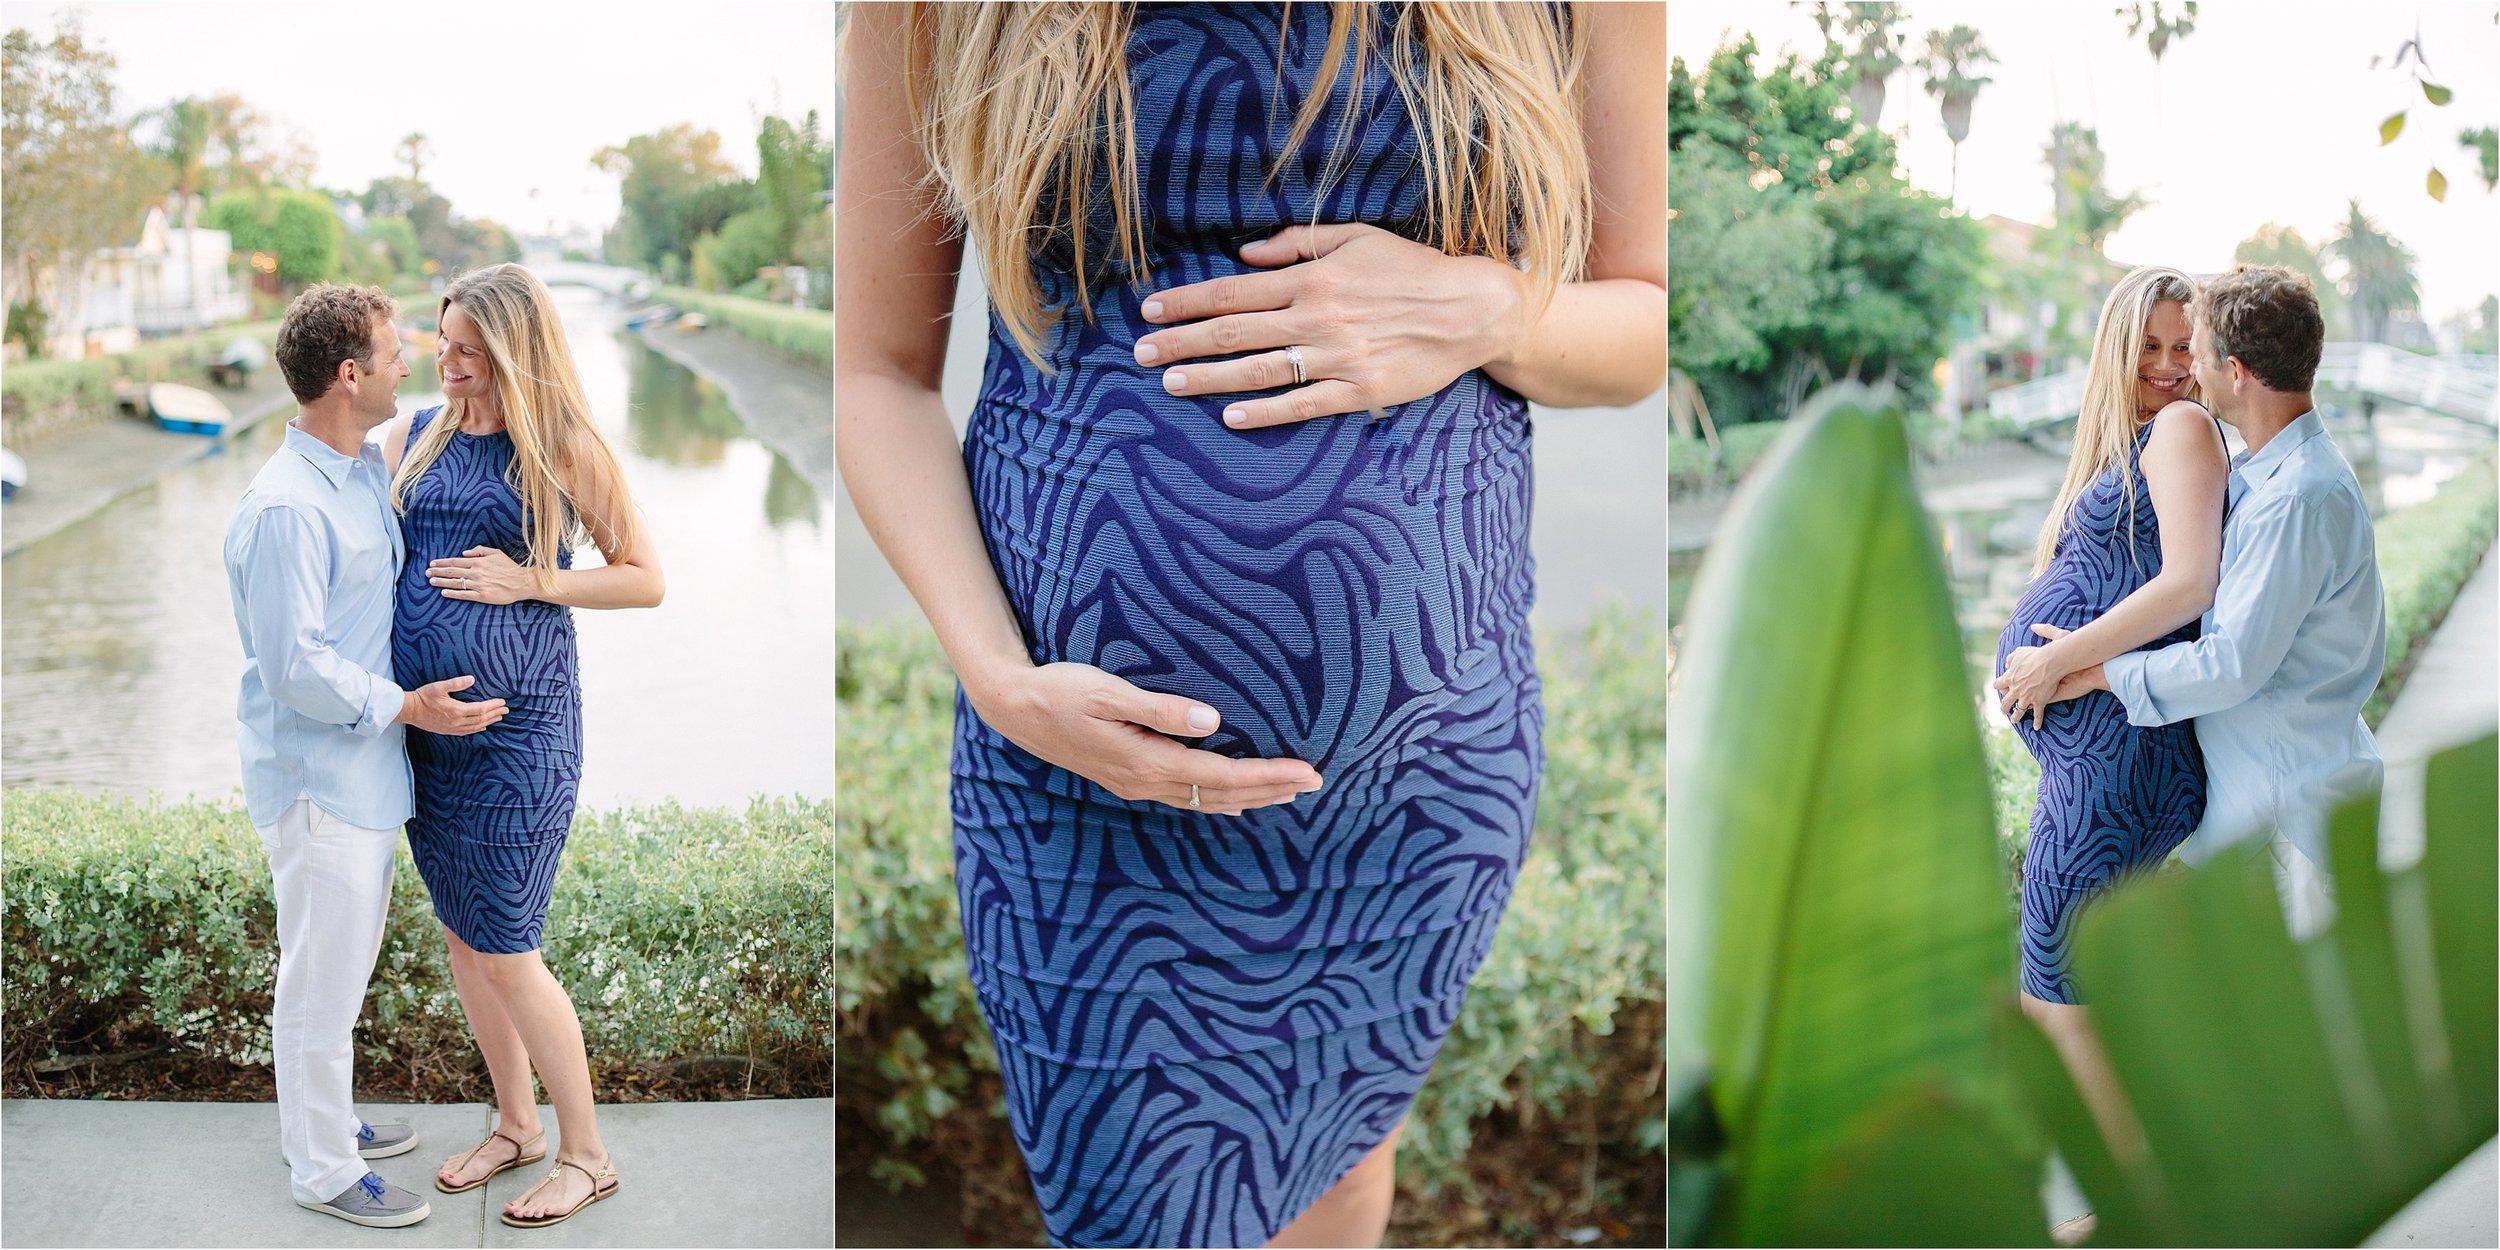 Venice Pregnancy Photo